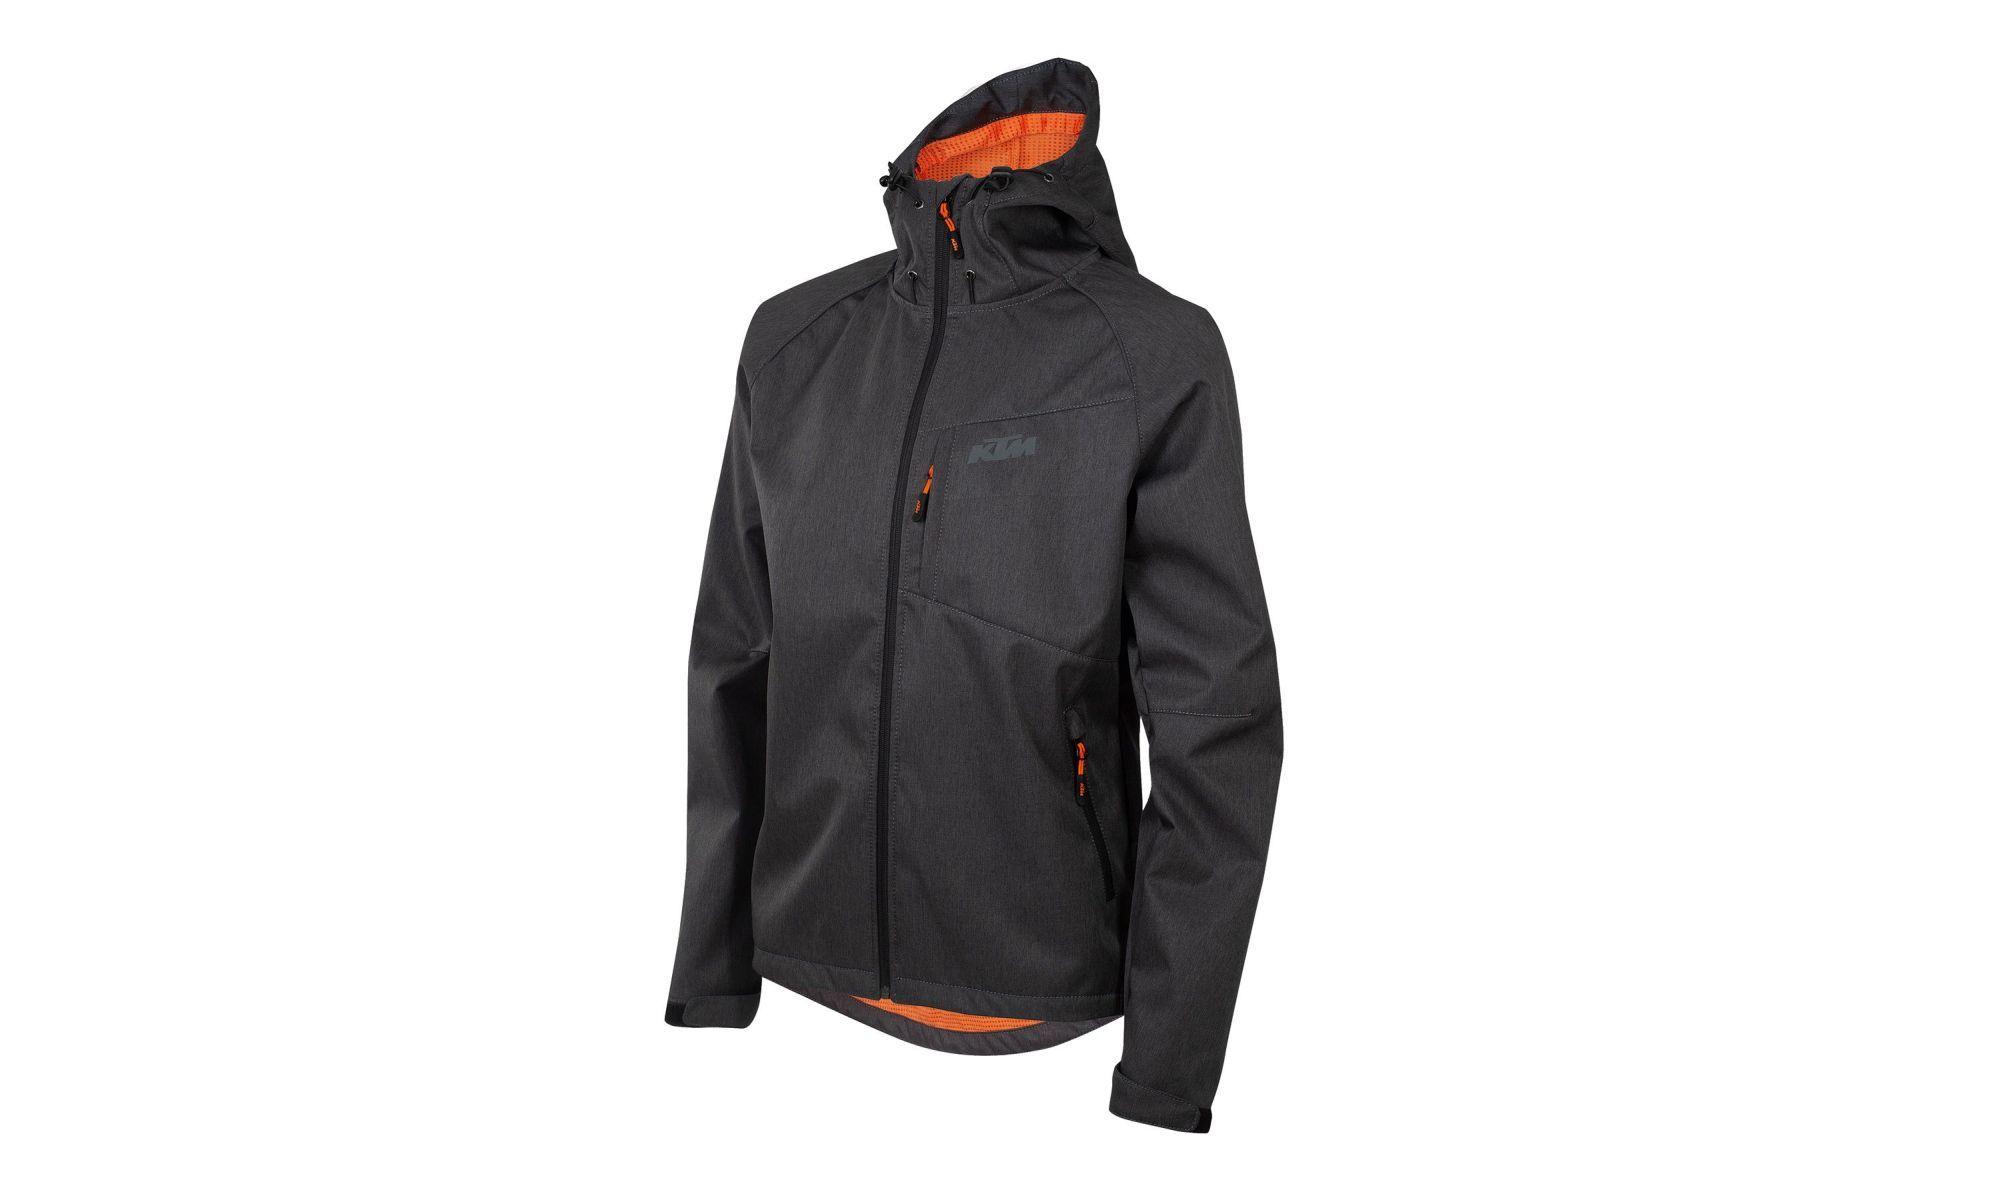 KTM Atmungsaktive Radsportjacke Factory Team Softshell Jacket